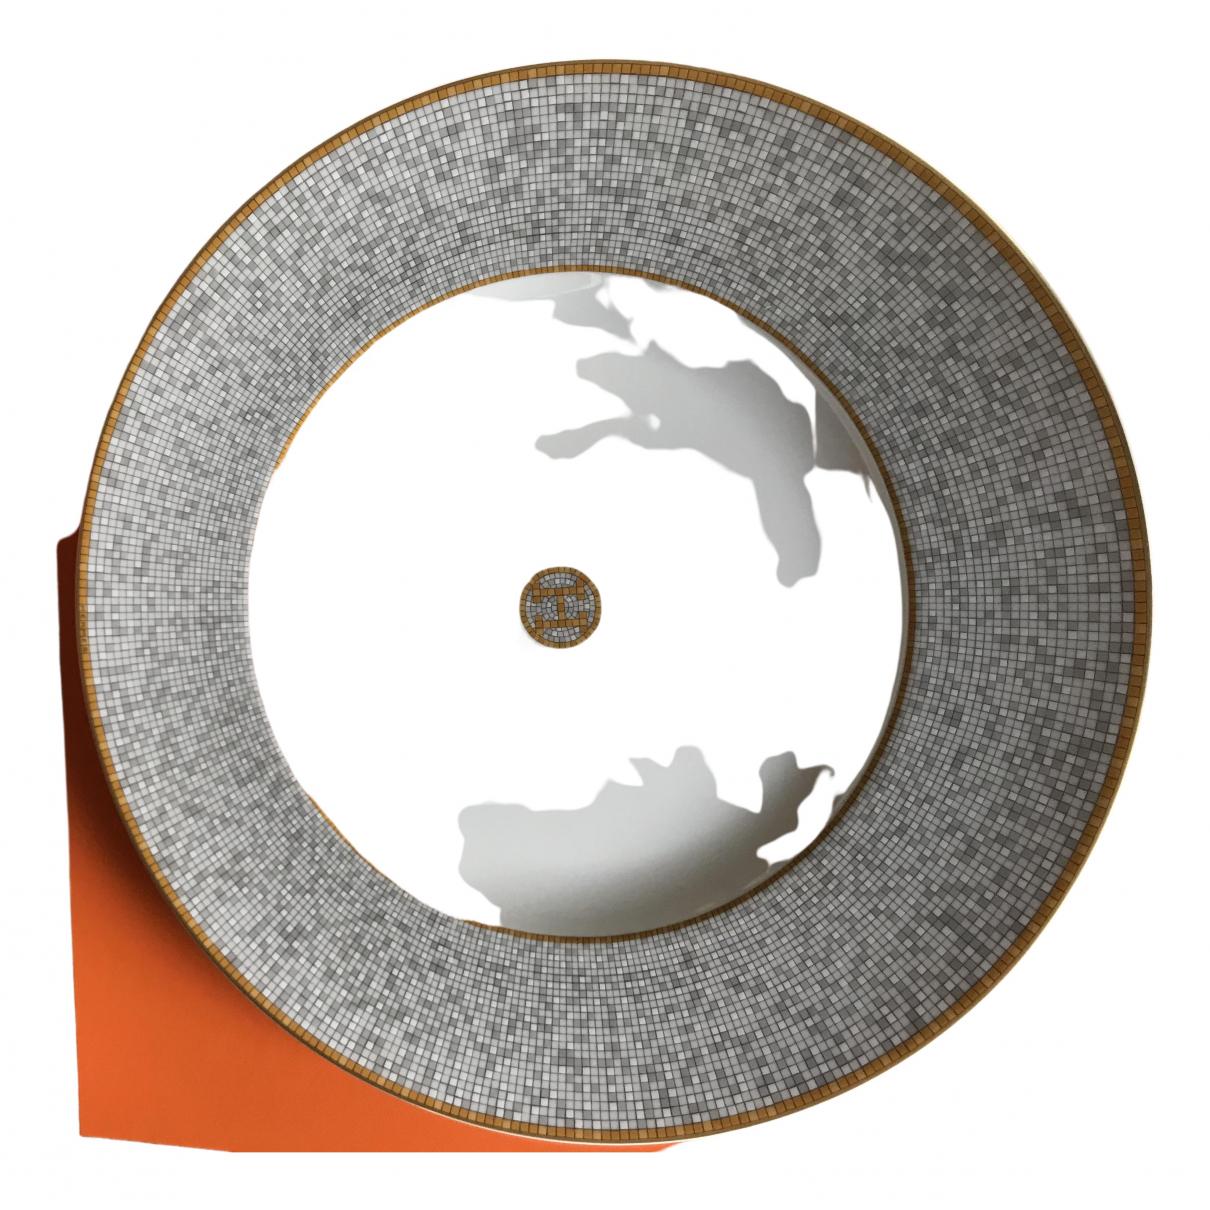 Hermès Mosaïque au 24 White Porcelain Dinnerware for Life & Living N